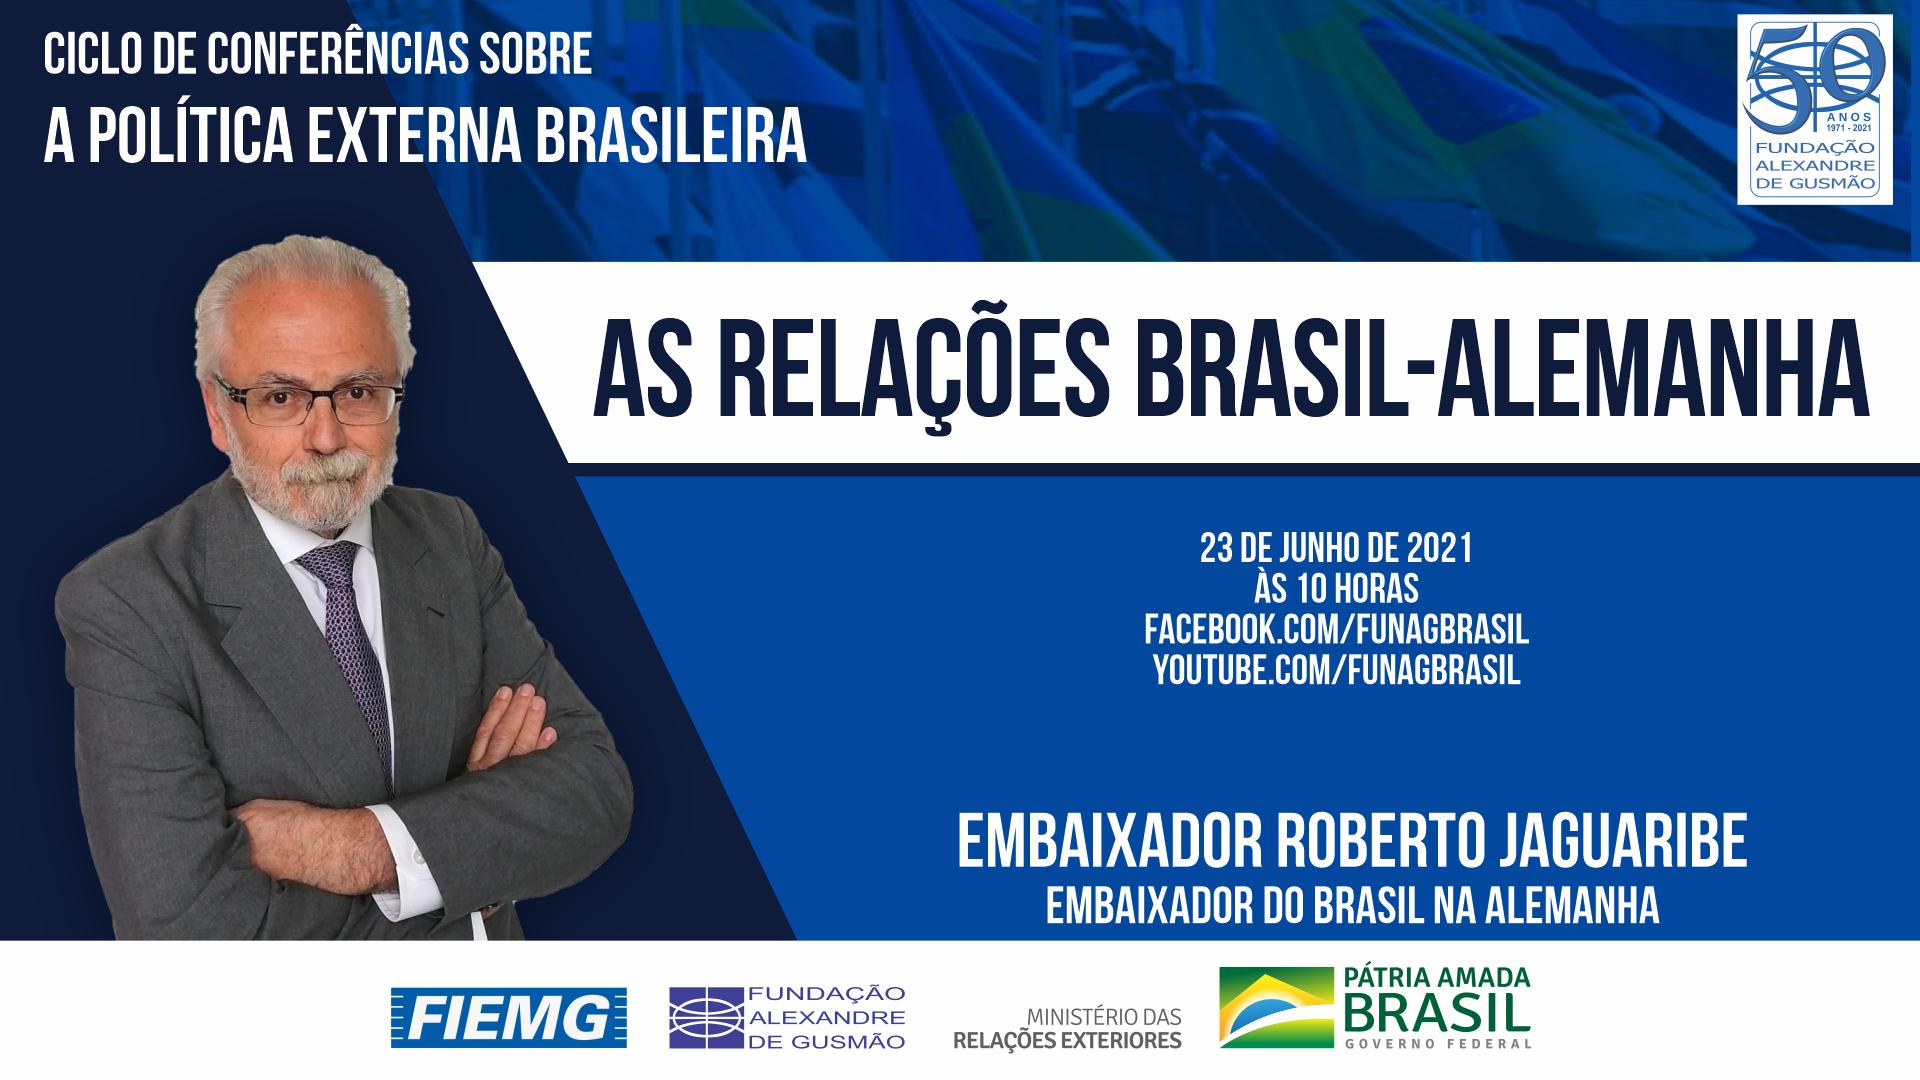 FUNAG promove conferência do Embaixador do Brasil na Alemanha, Roberto Jaguaribe